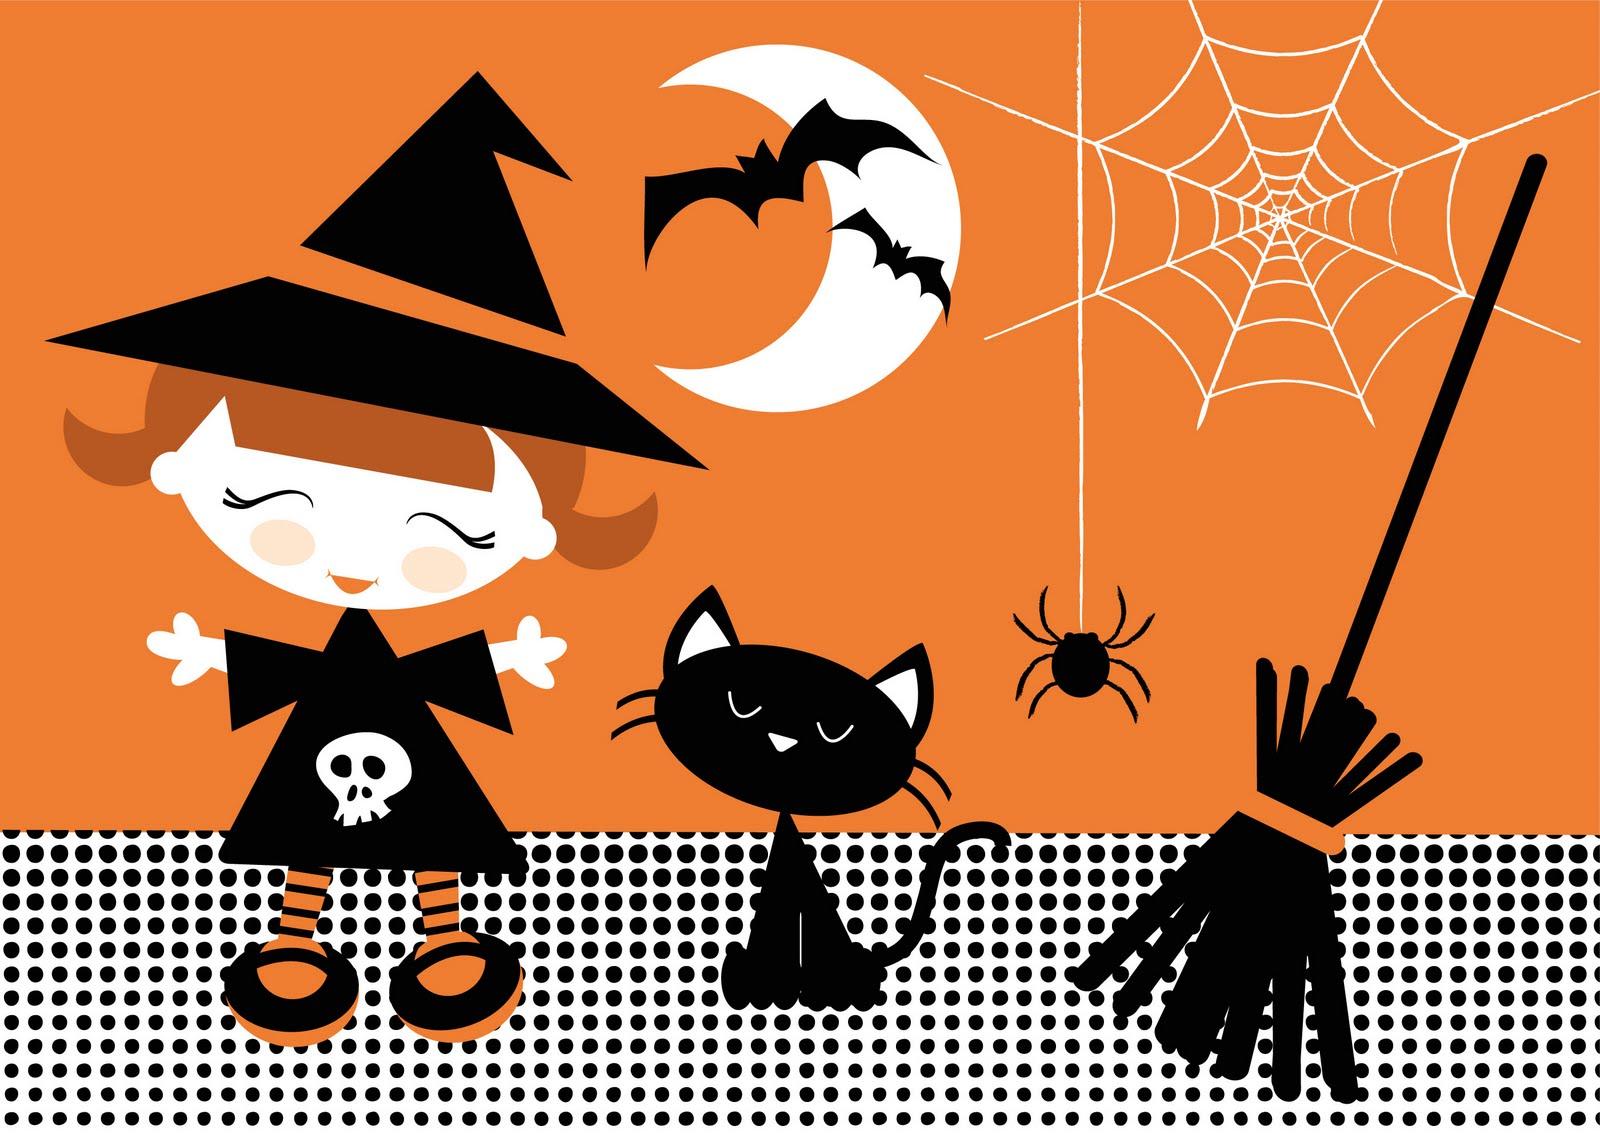 dibujo de bruja con gato, murcielagos, escoba arañas. Brujas de halloween para imprimir